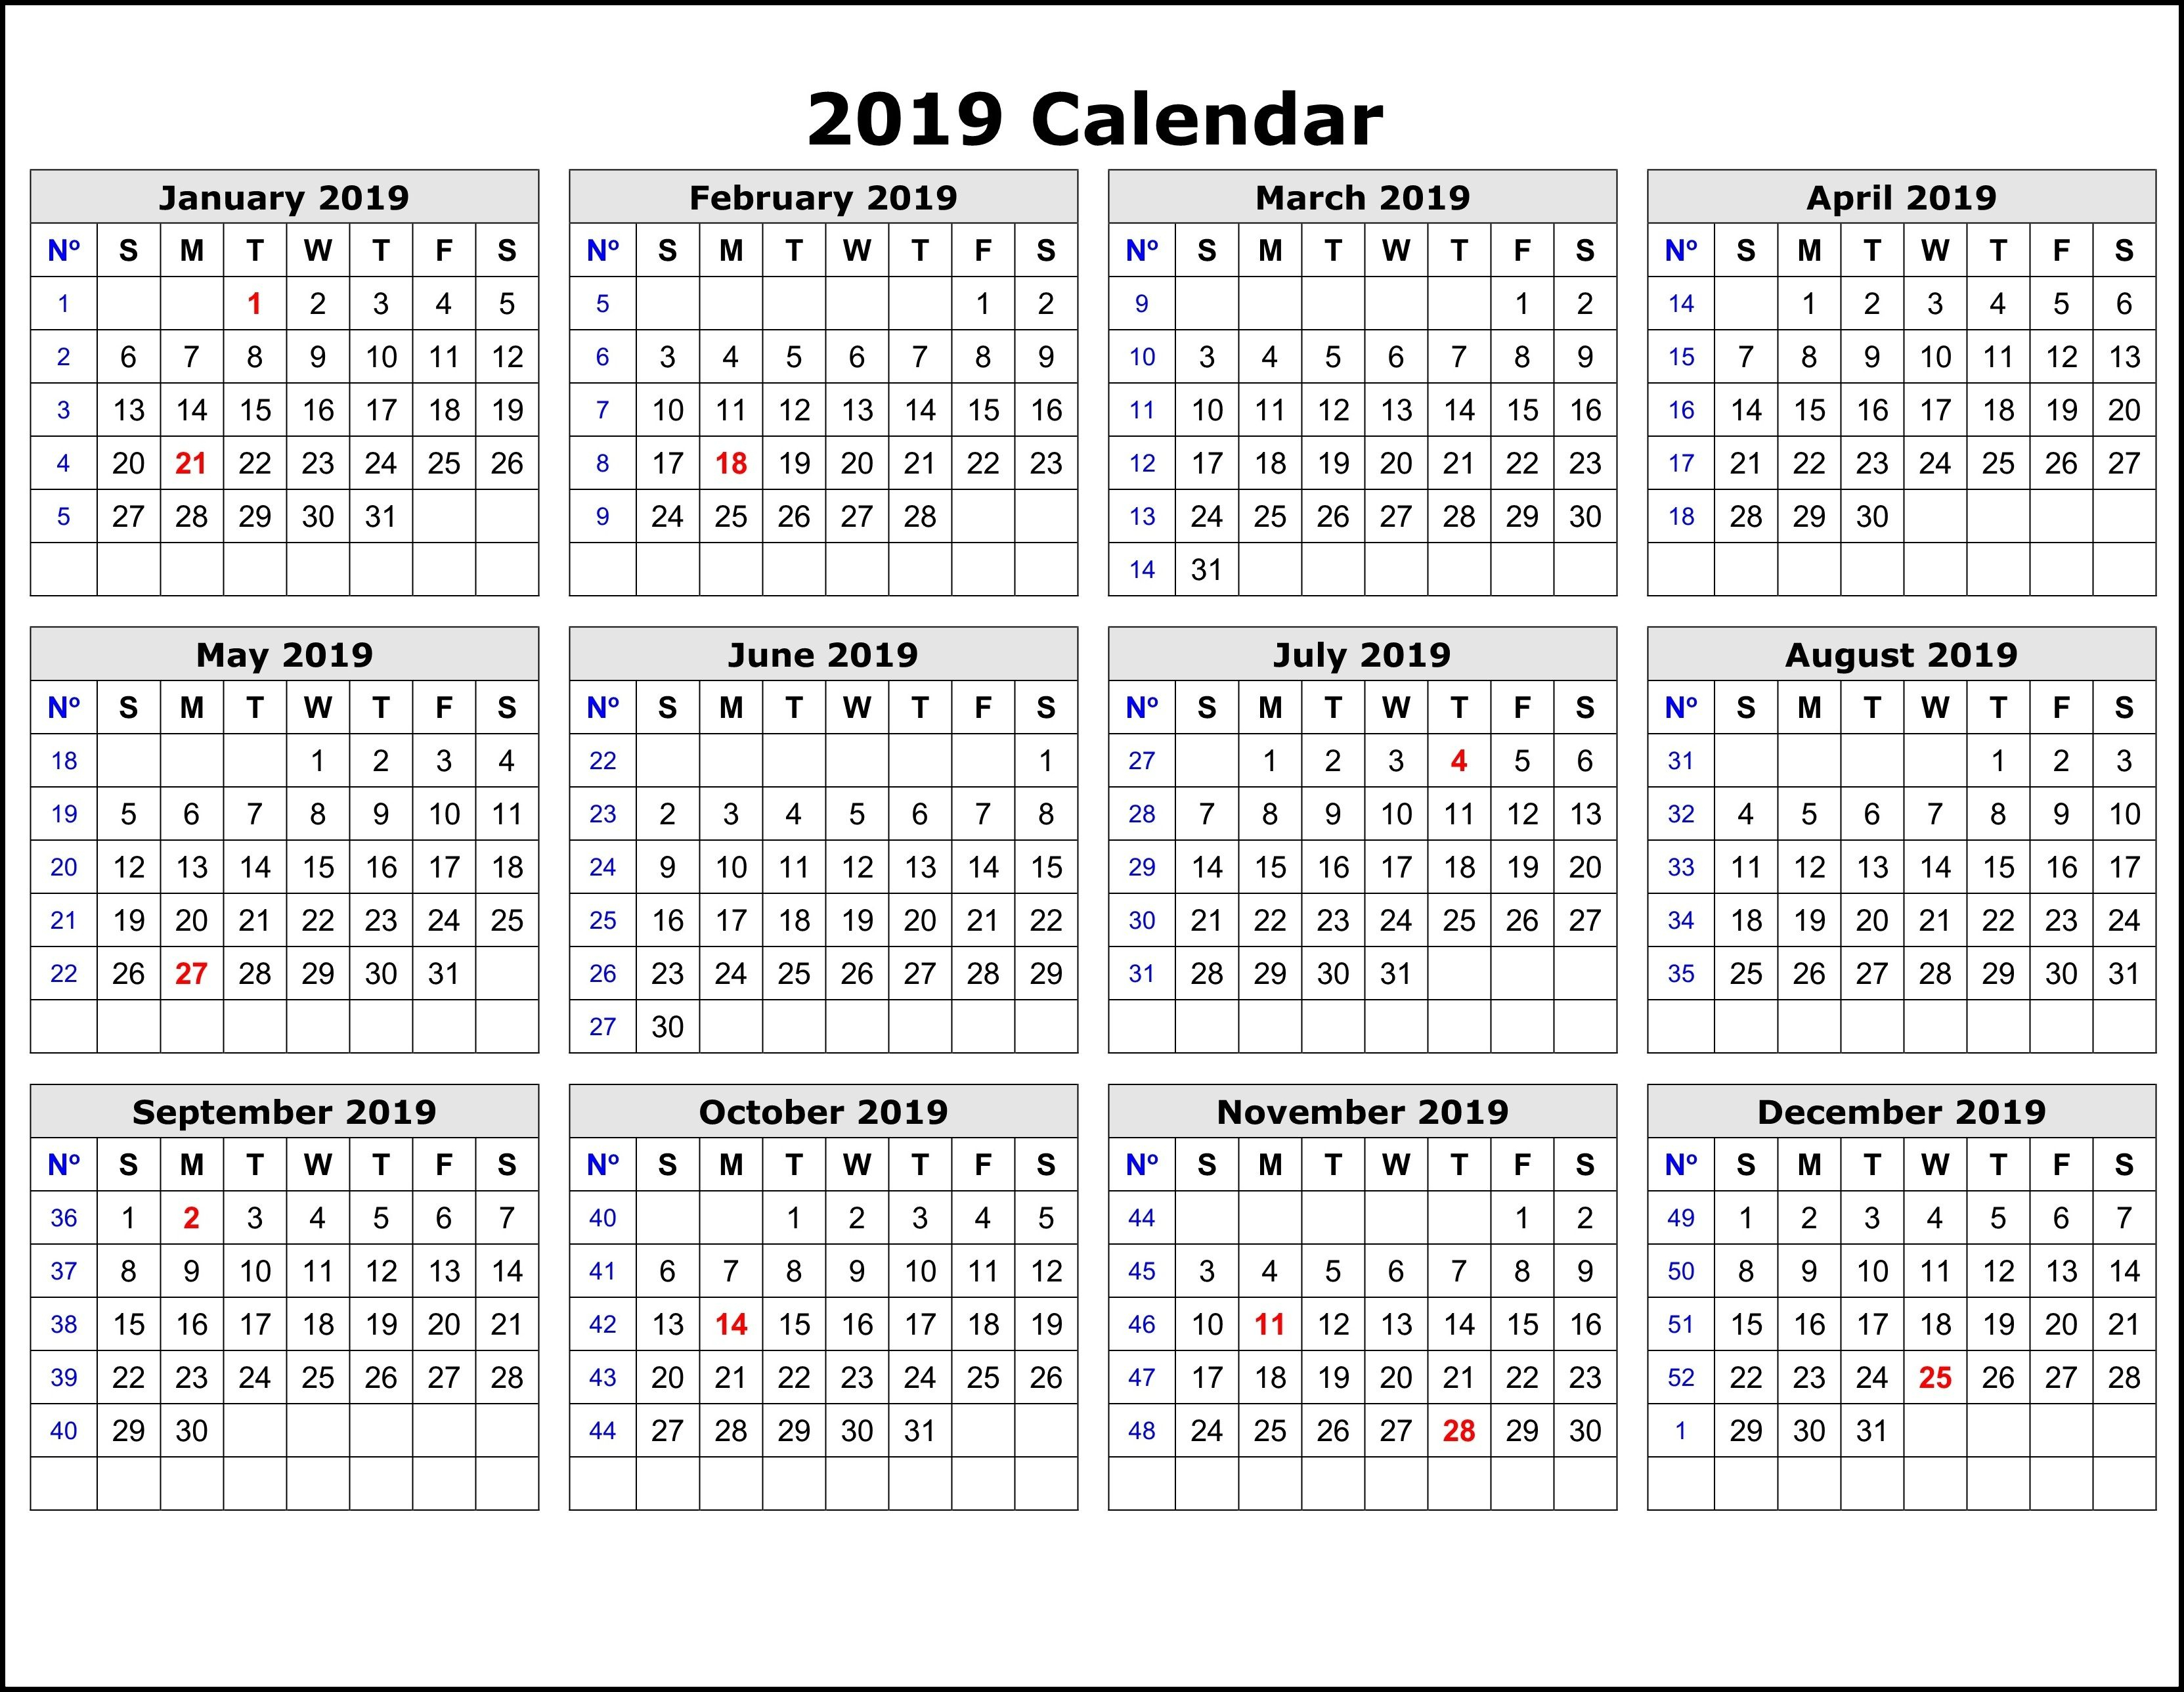 2019 Calendar Templateweek | Adobe Photoshop | Printable in Split Calendar 2019 2020 South Australia